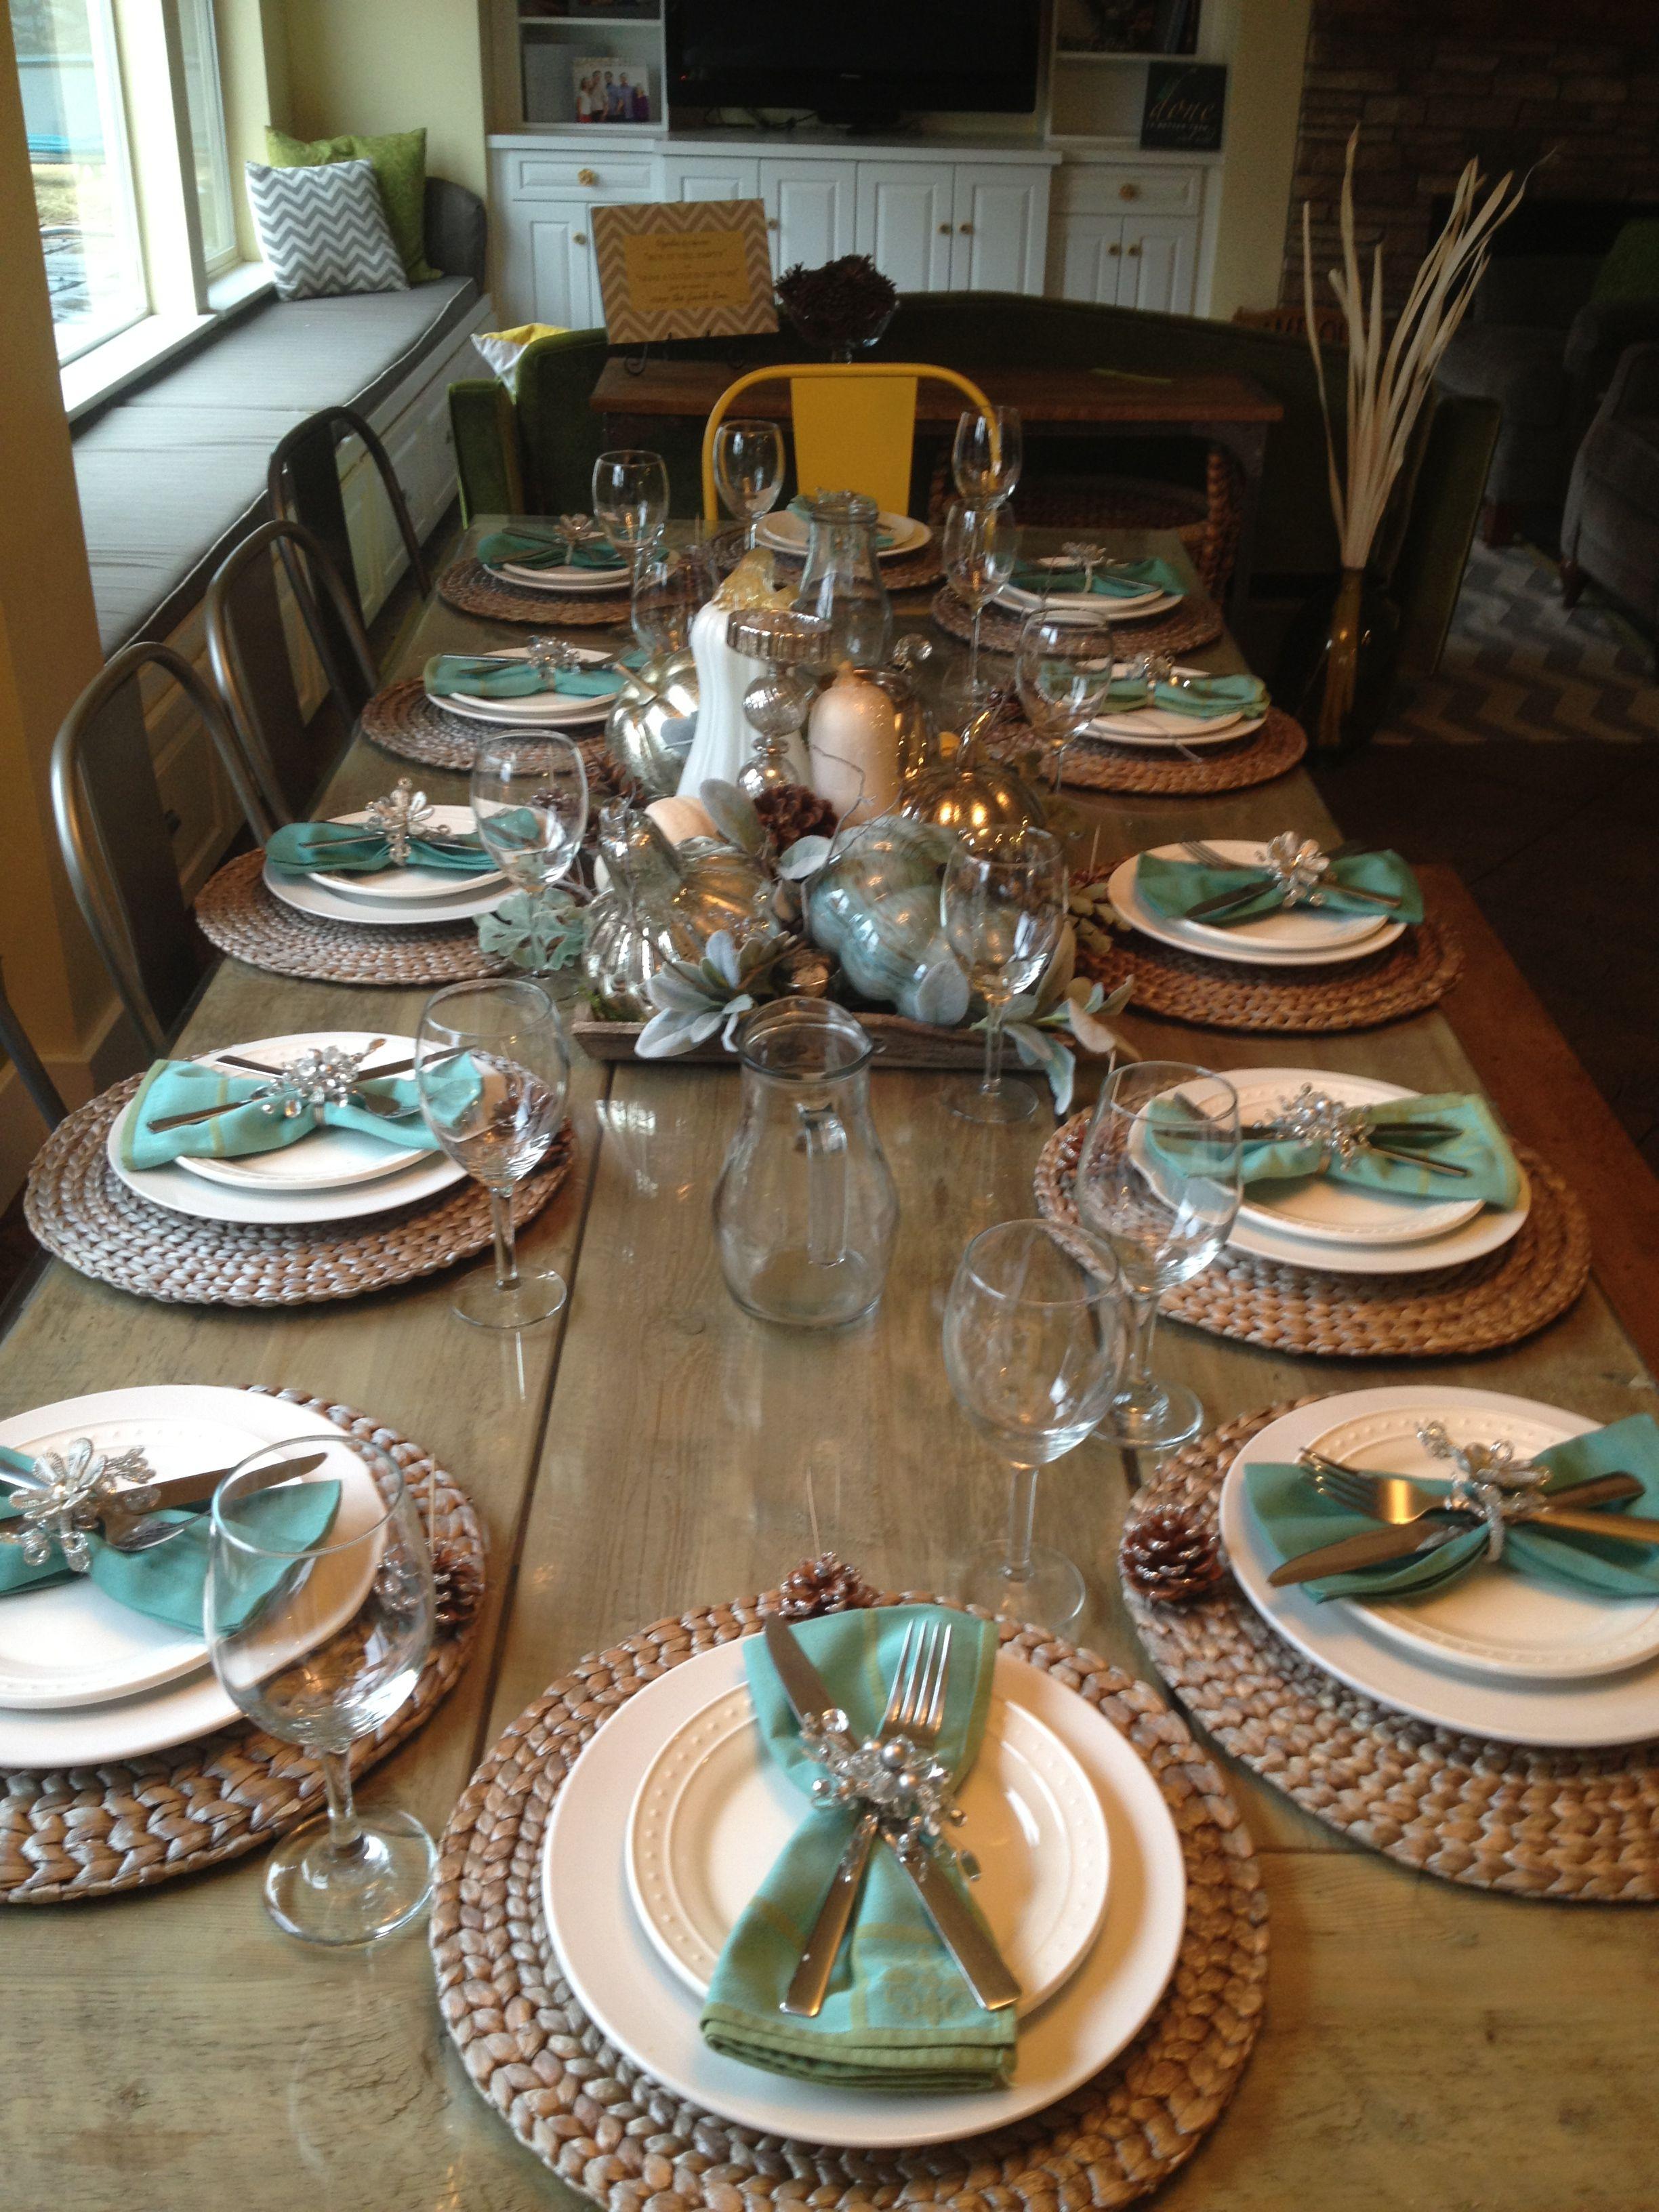 thanksgiving table setting more - Thanksgiving Table Settings Pinterest